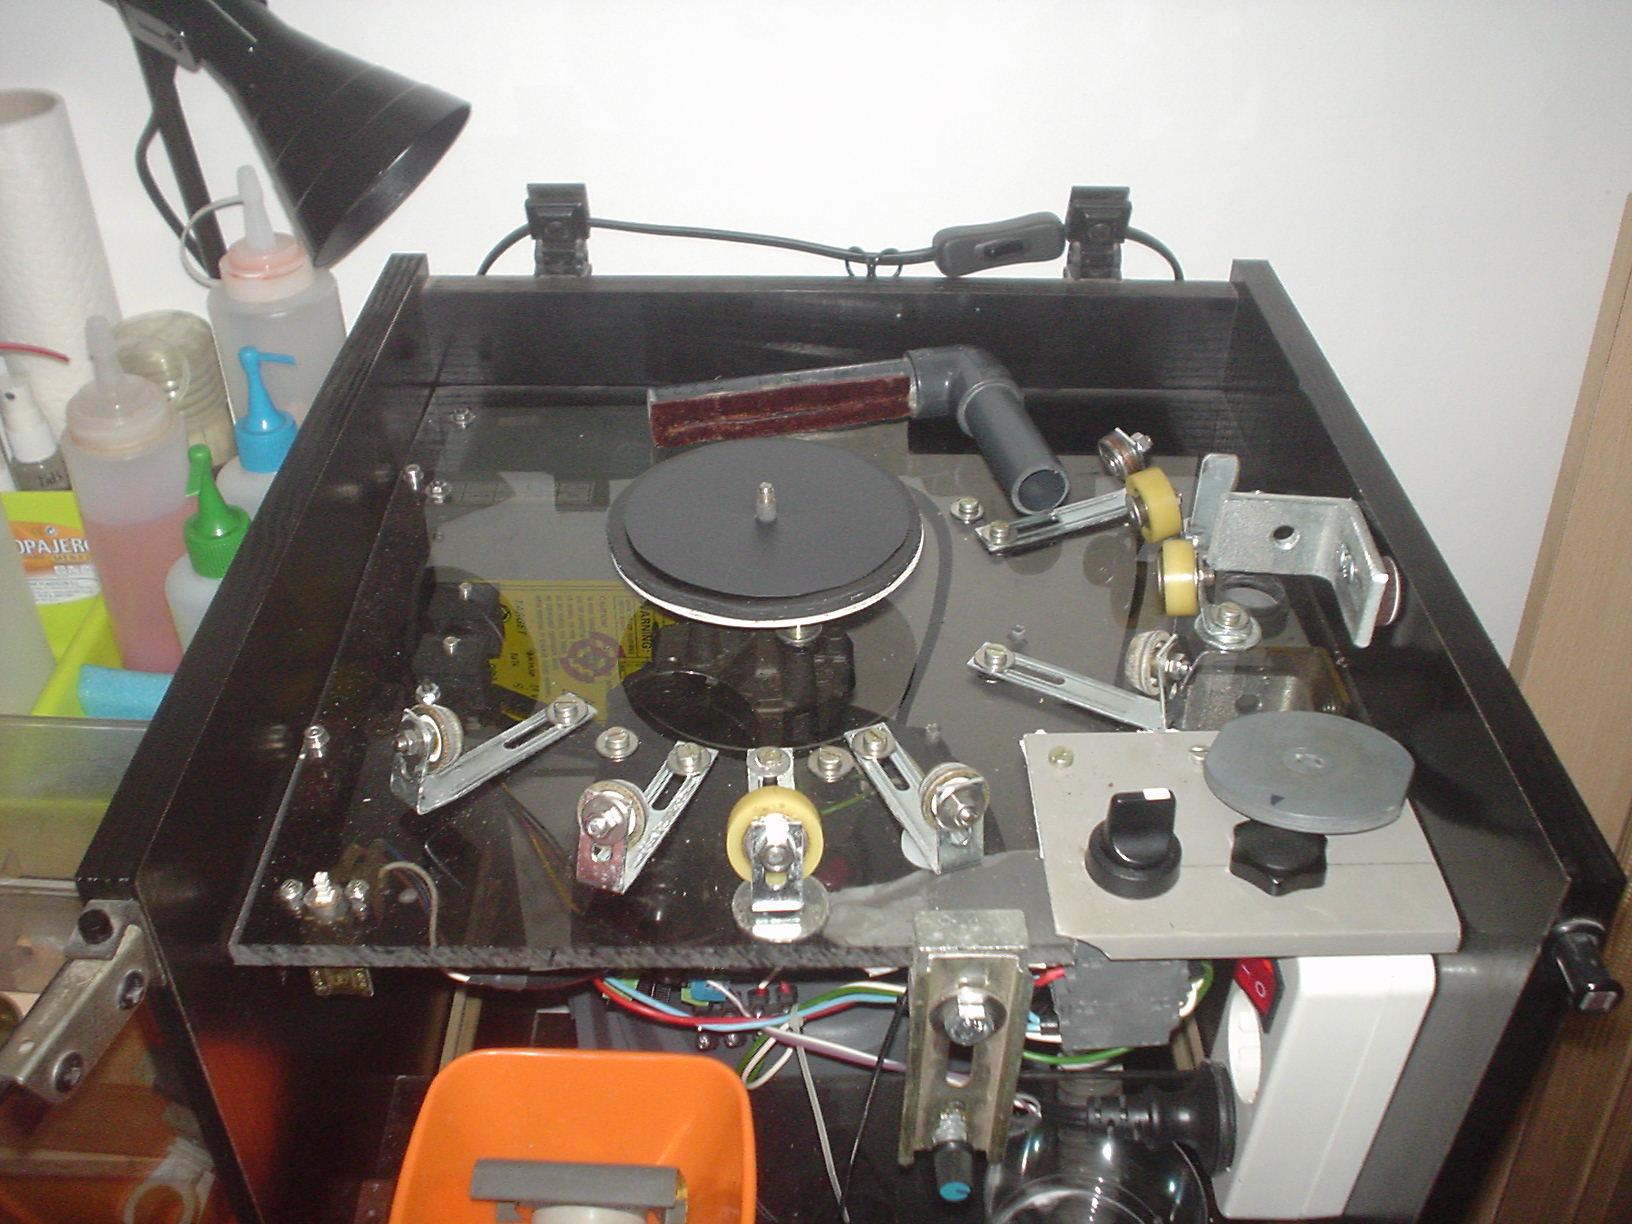 Maquina para limpiar vinilos 2_dwu9